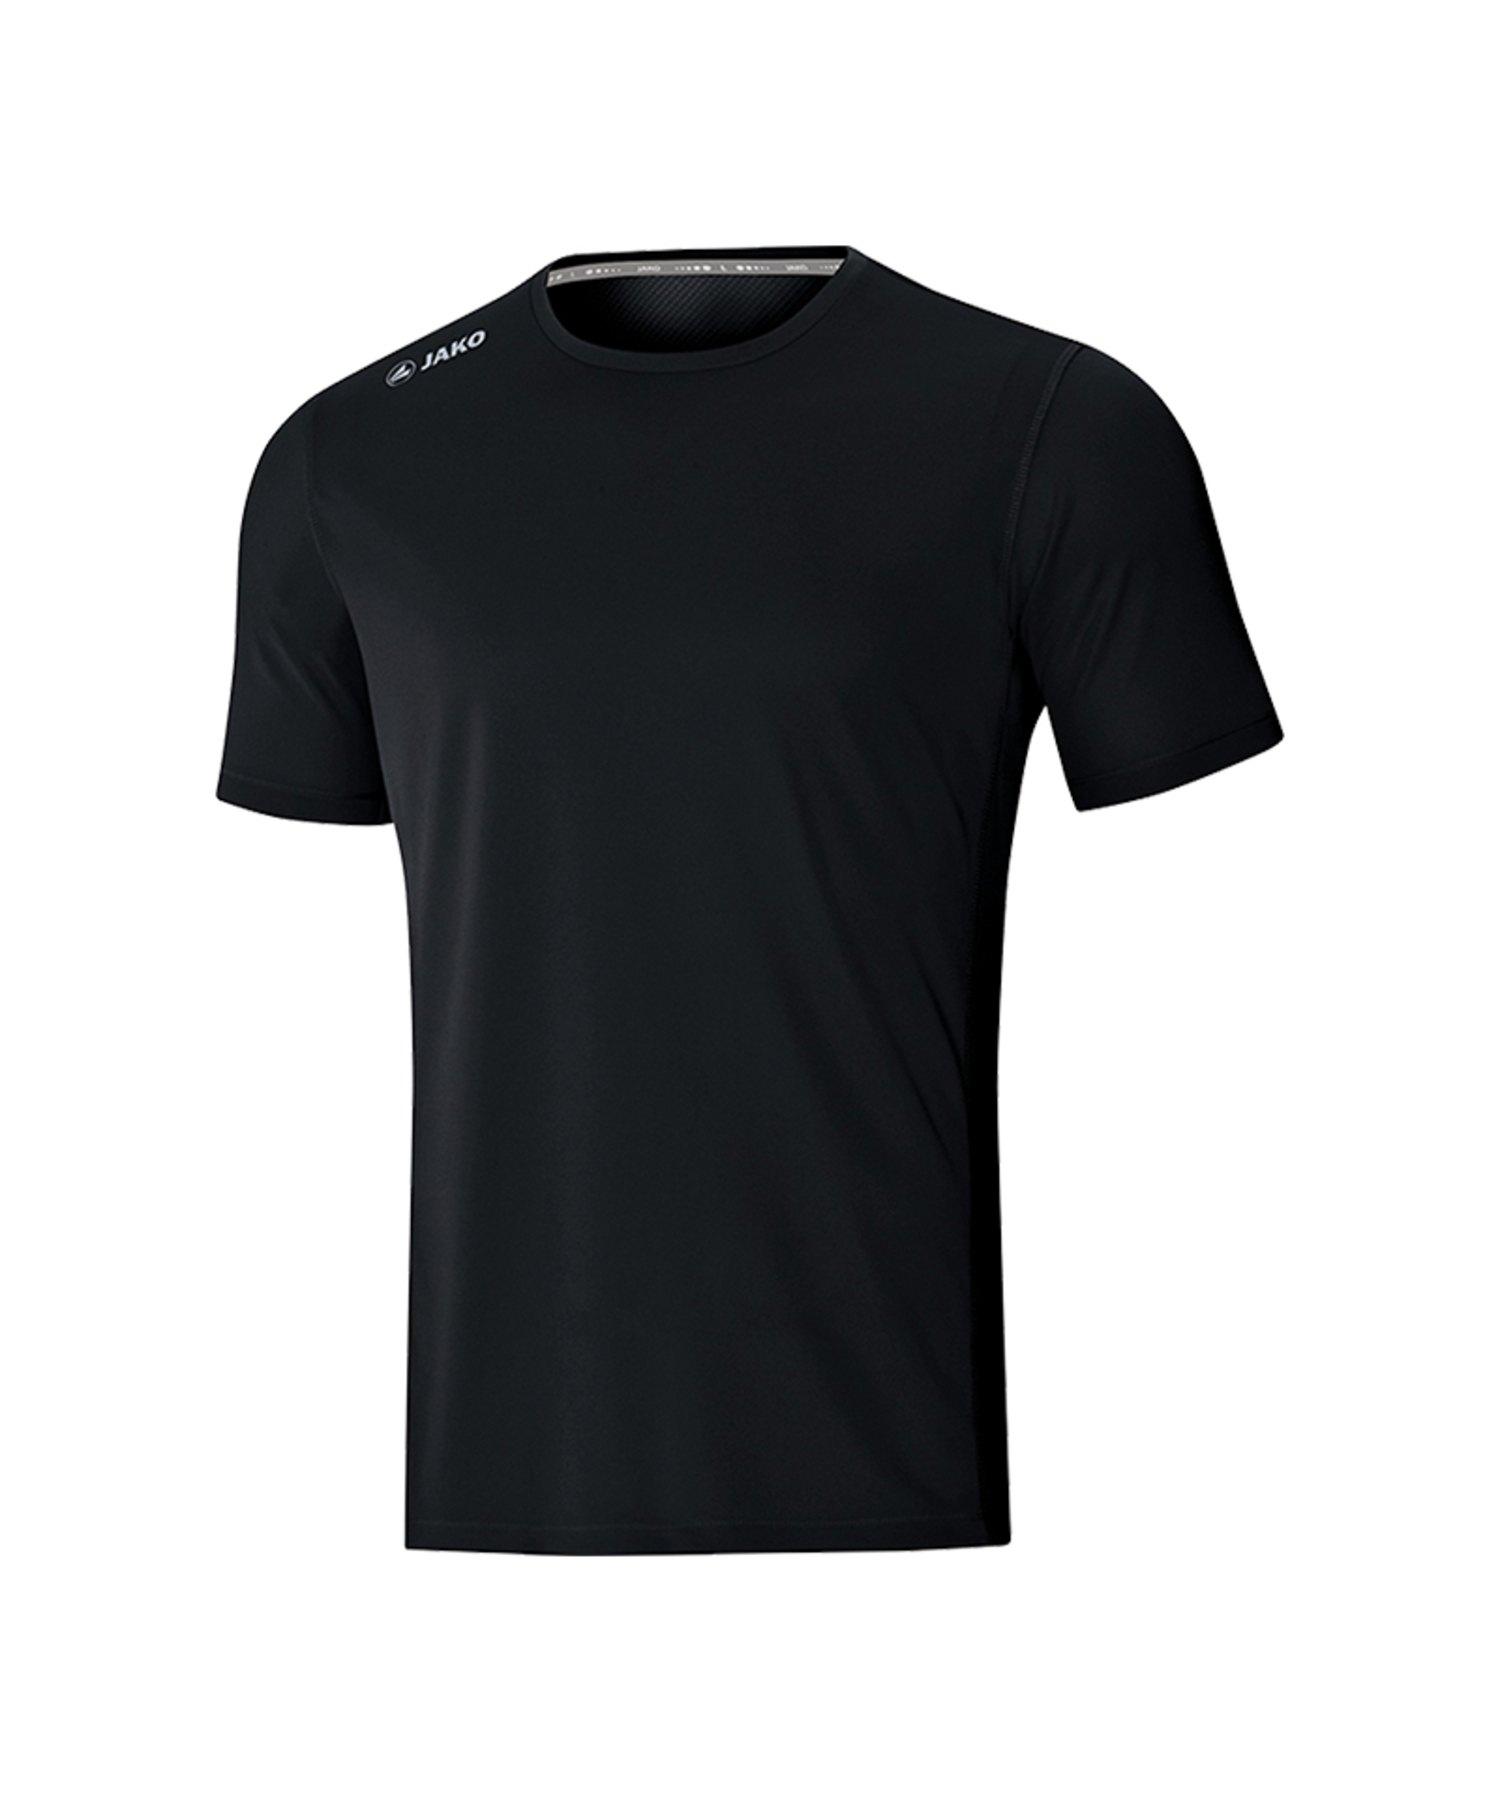 Jako Run 2.0 T-Shirt Running Schwarz F08 - Schwarz